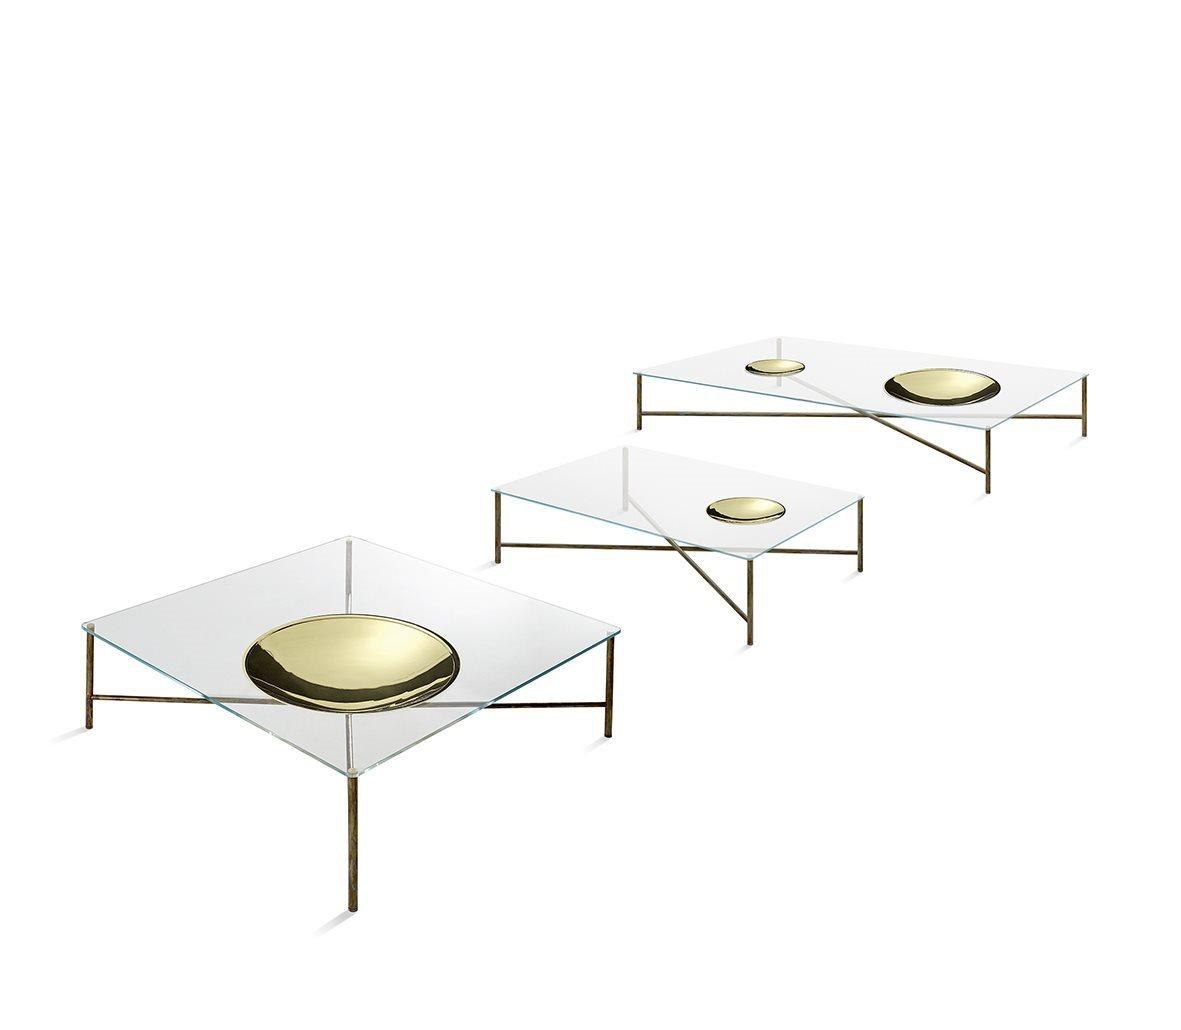 Golden Moon GallottiRadice glass furniture milan 2015